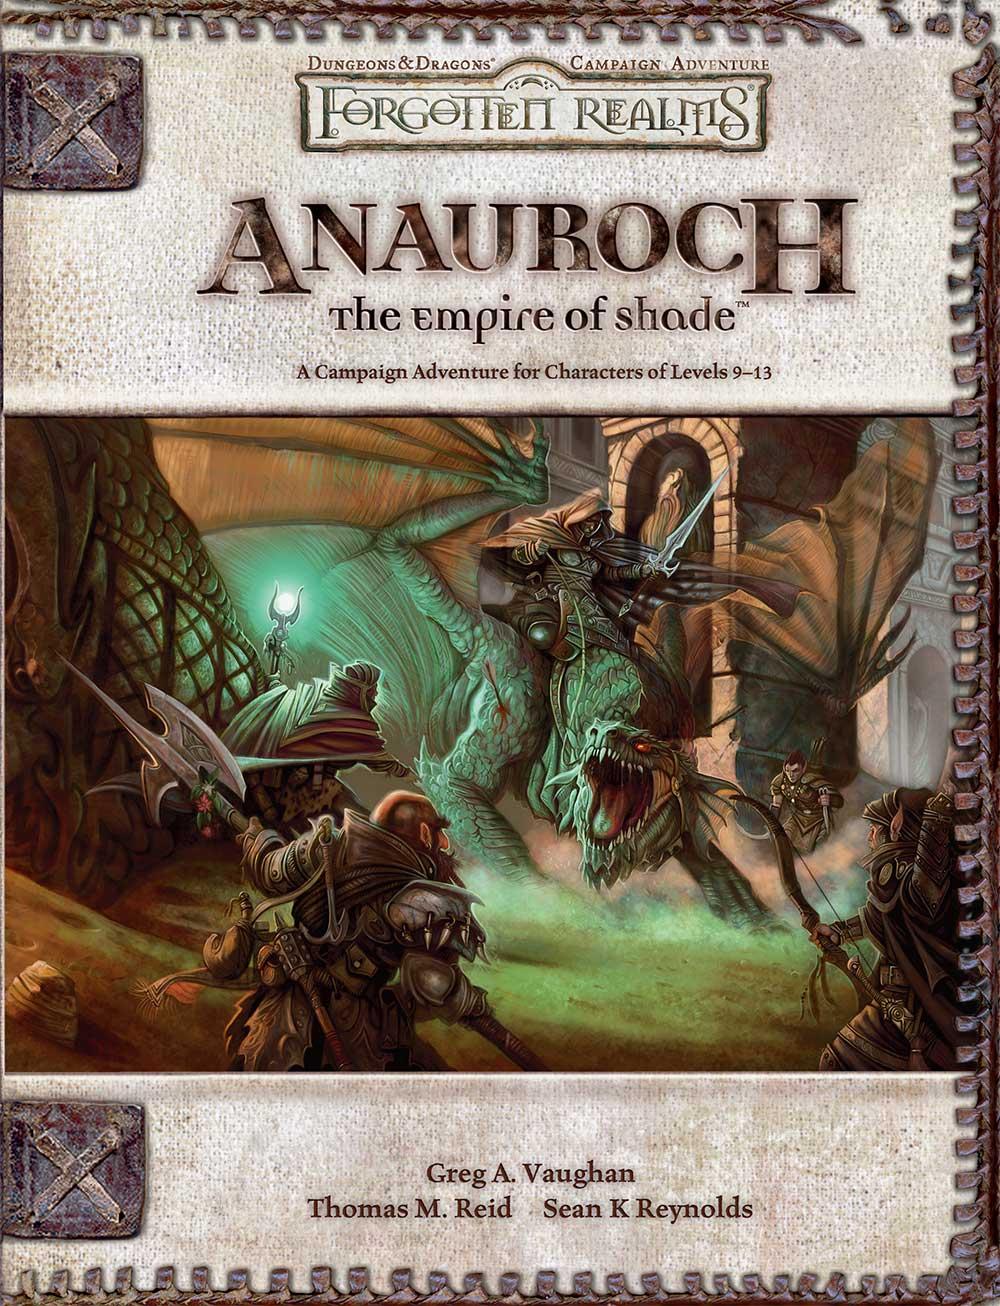 Anauroch: The Empire of Shade